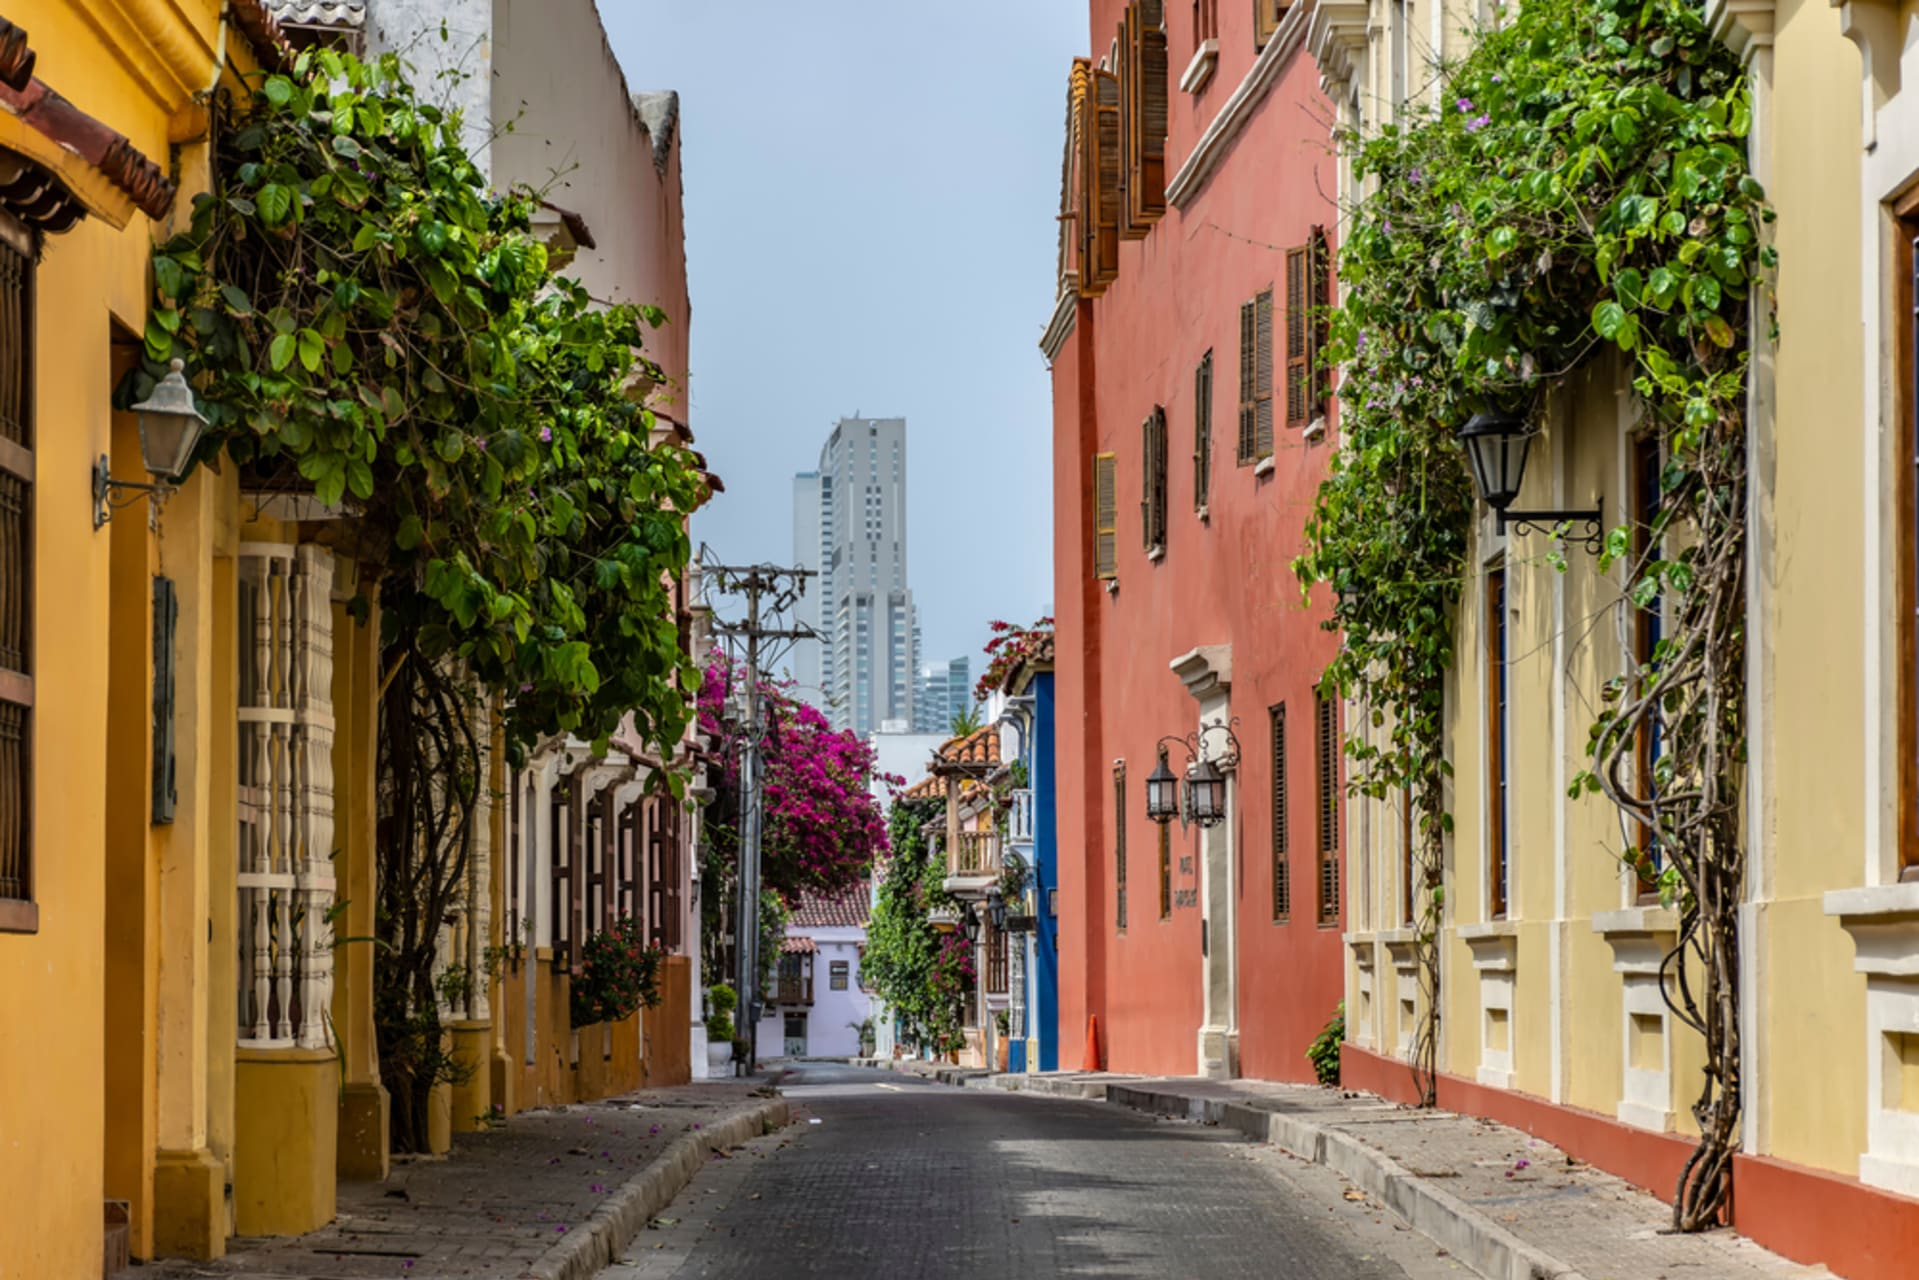 Cartagena - San Diego Neighborhood: World Heritage by UNESCO.